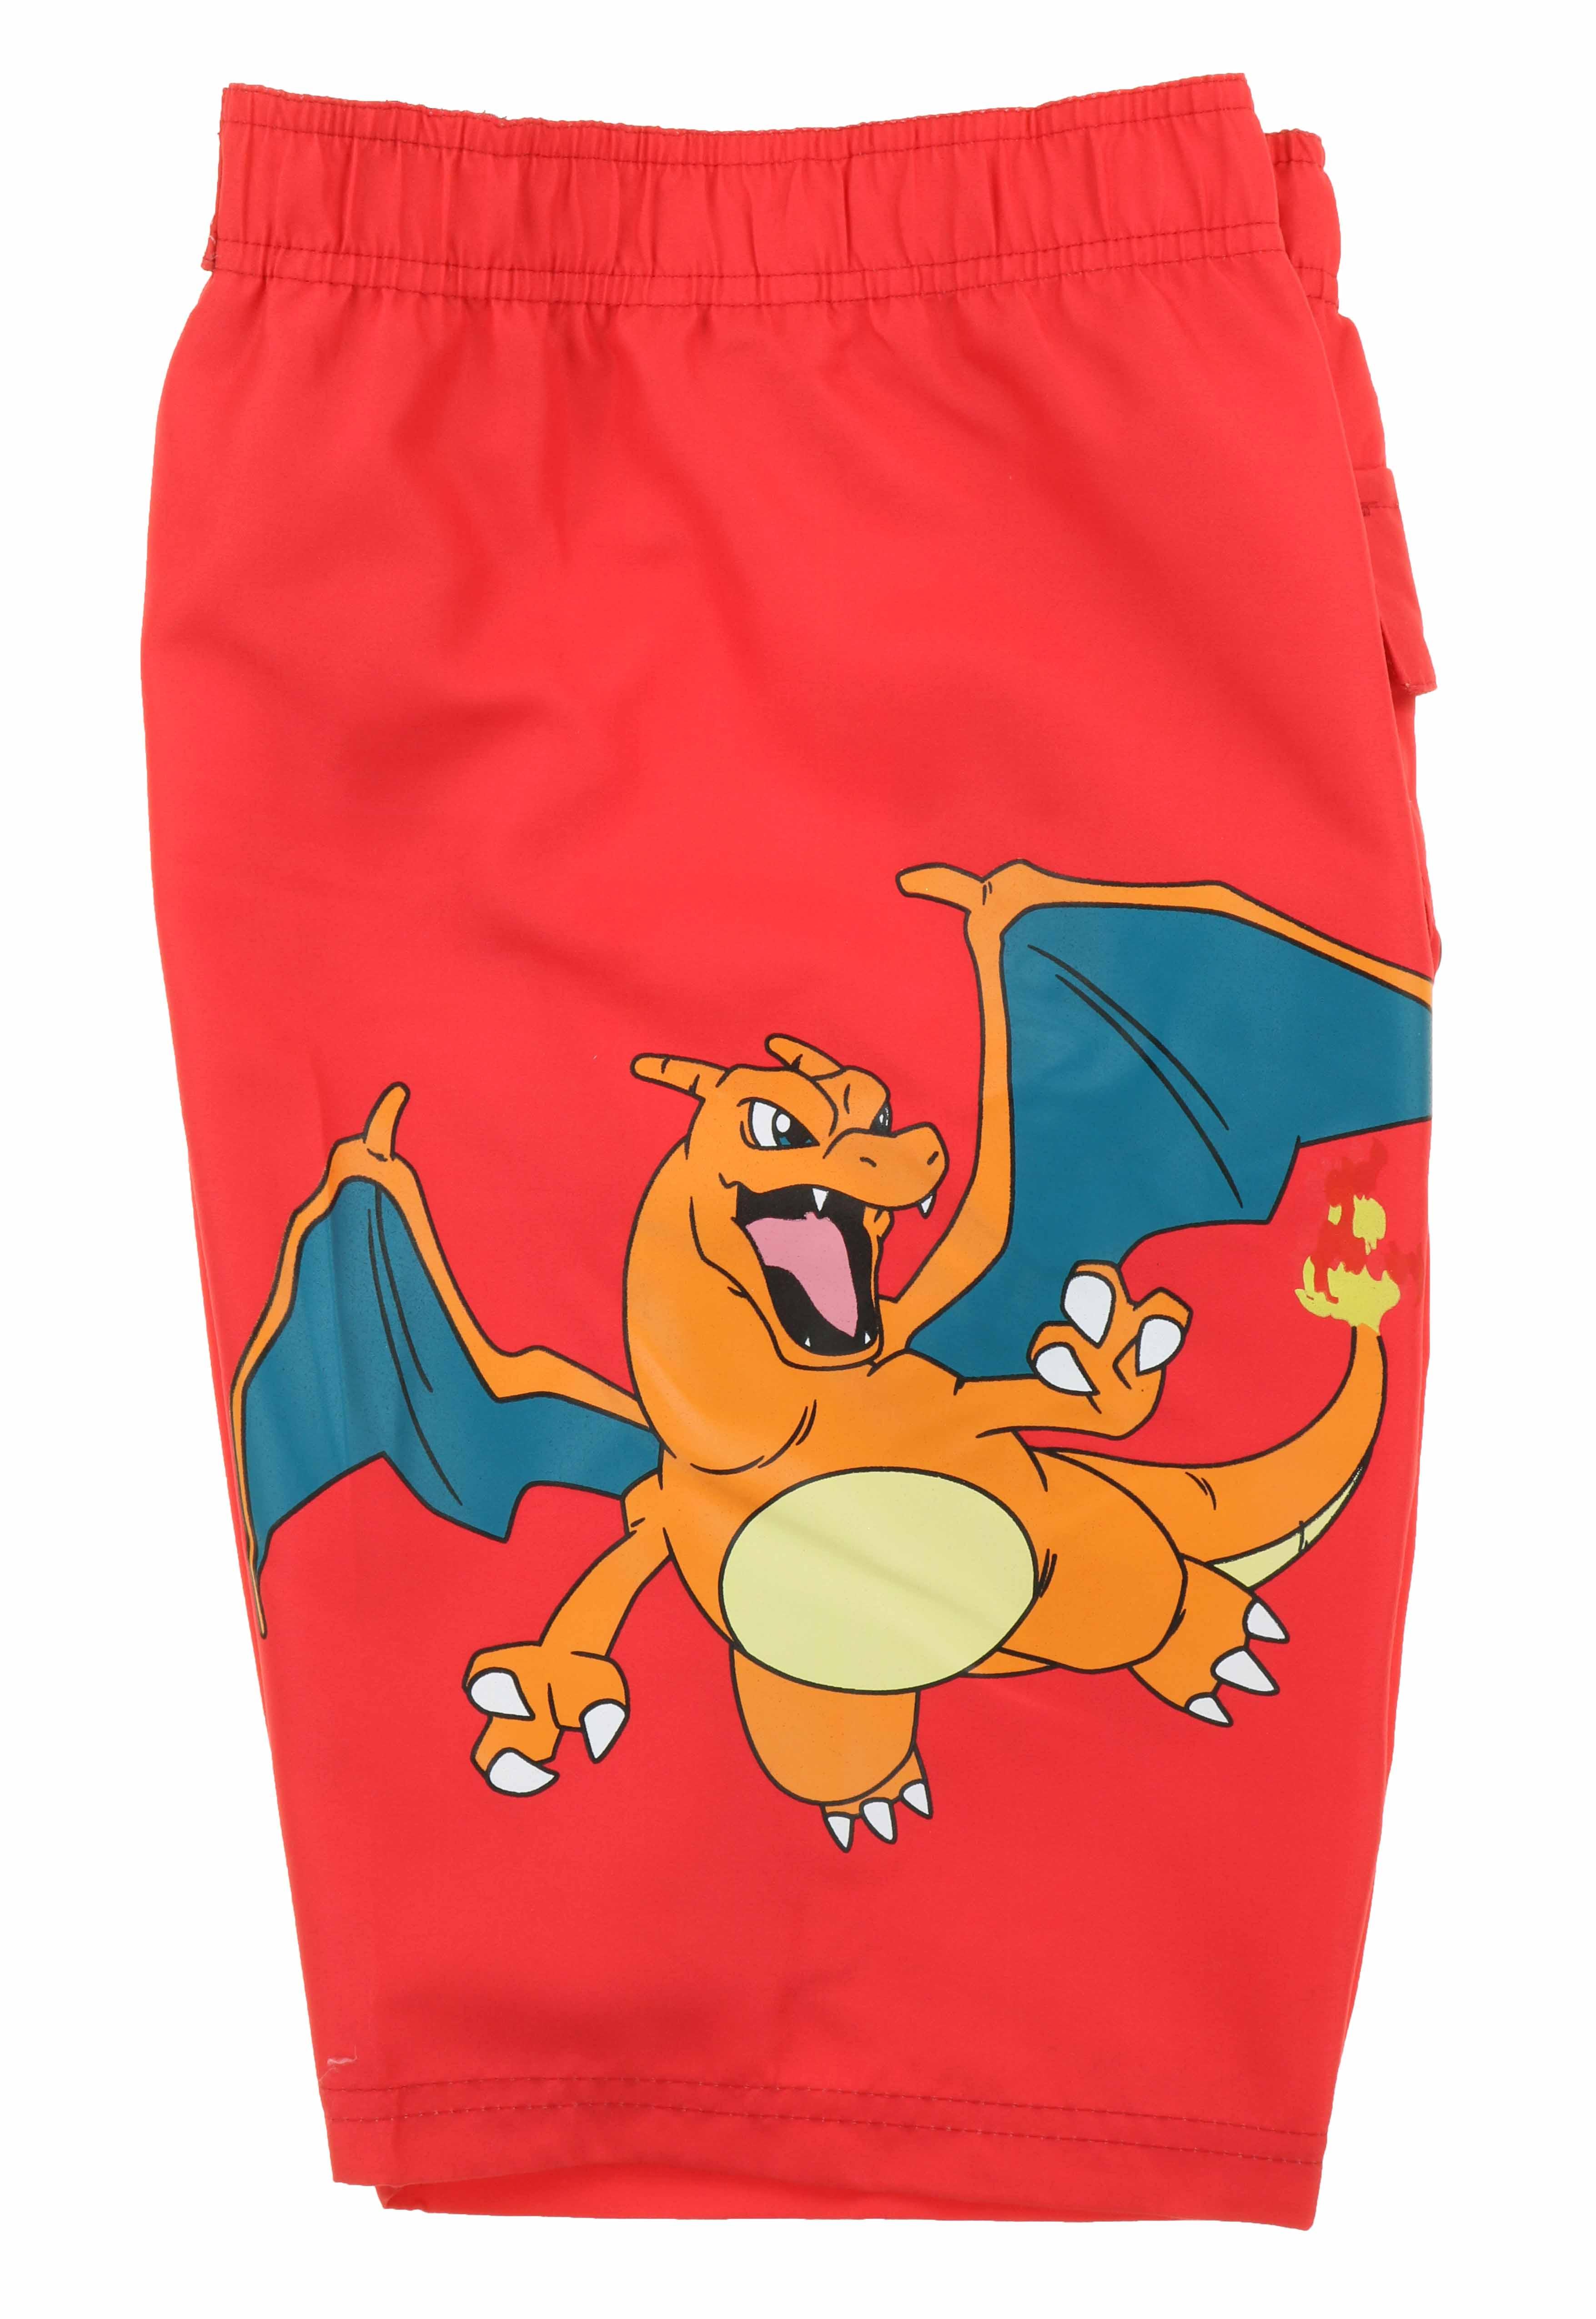 3621c7b4d7 InGear Boys Pokemon Swim Trunk Shorts-Pikachu,Charizard,Bulbasaur ...